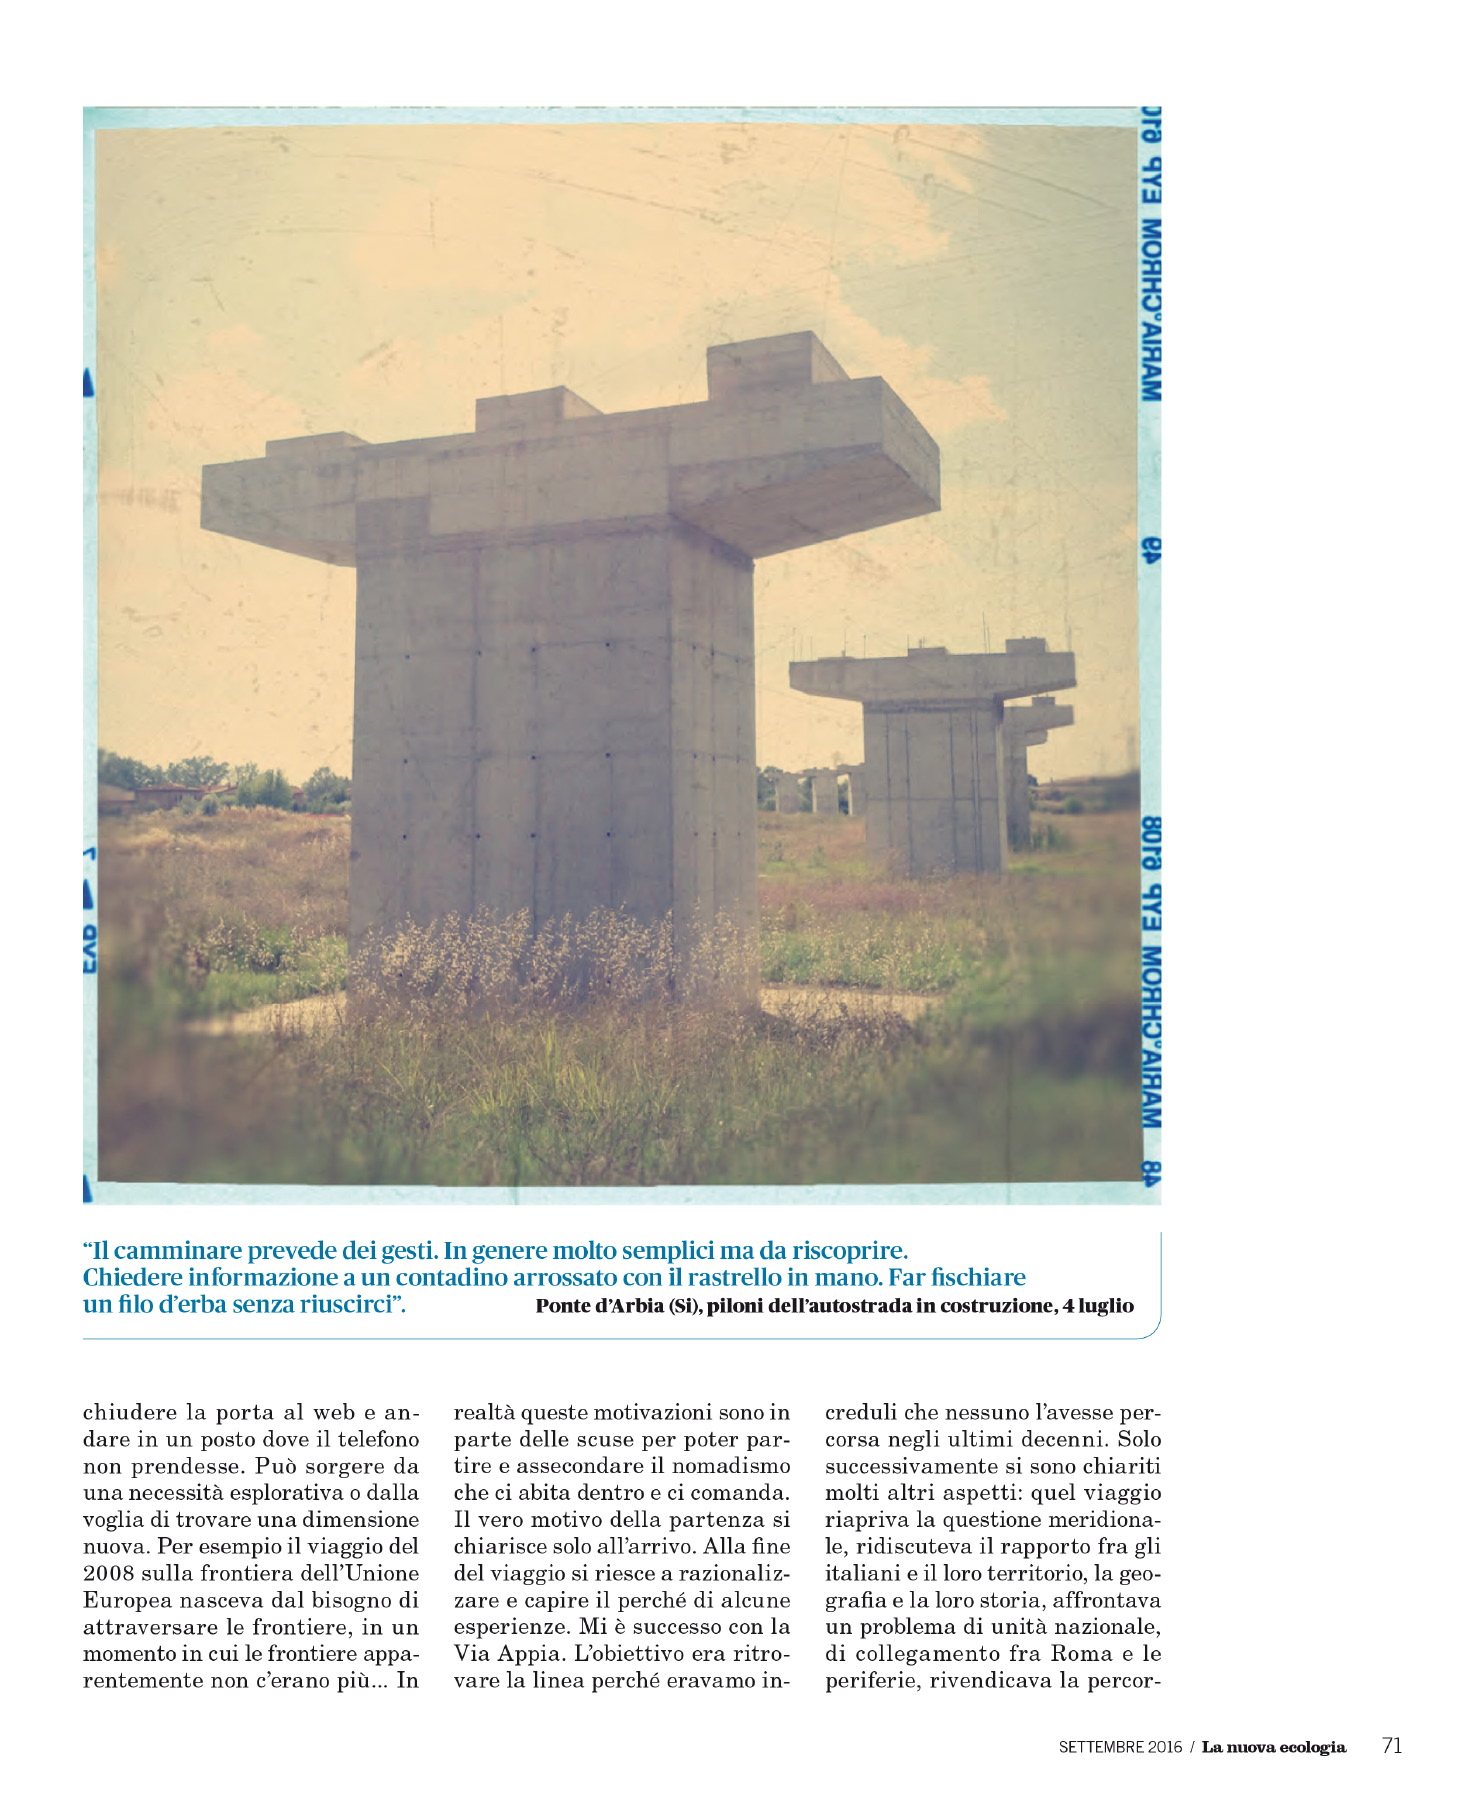 around-the-walk-_-pietro-vertamy-_tearsheet-nuova-ecologia-08